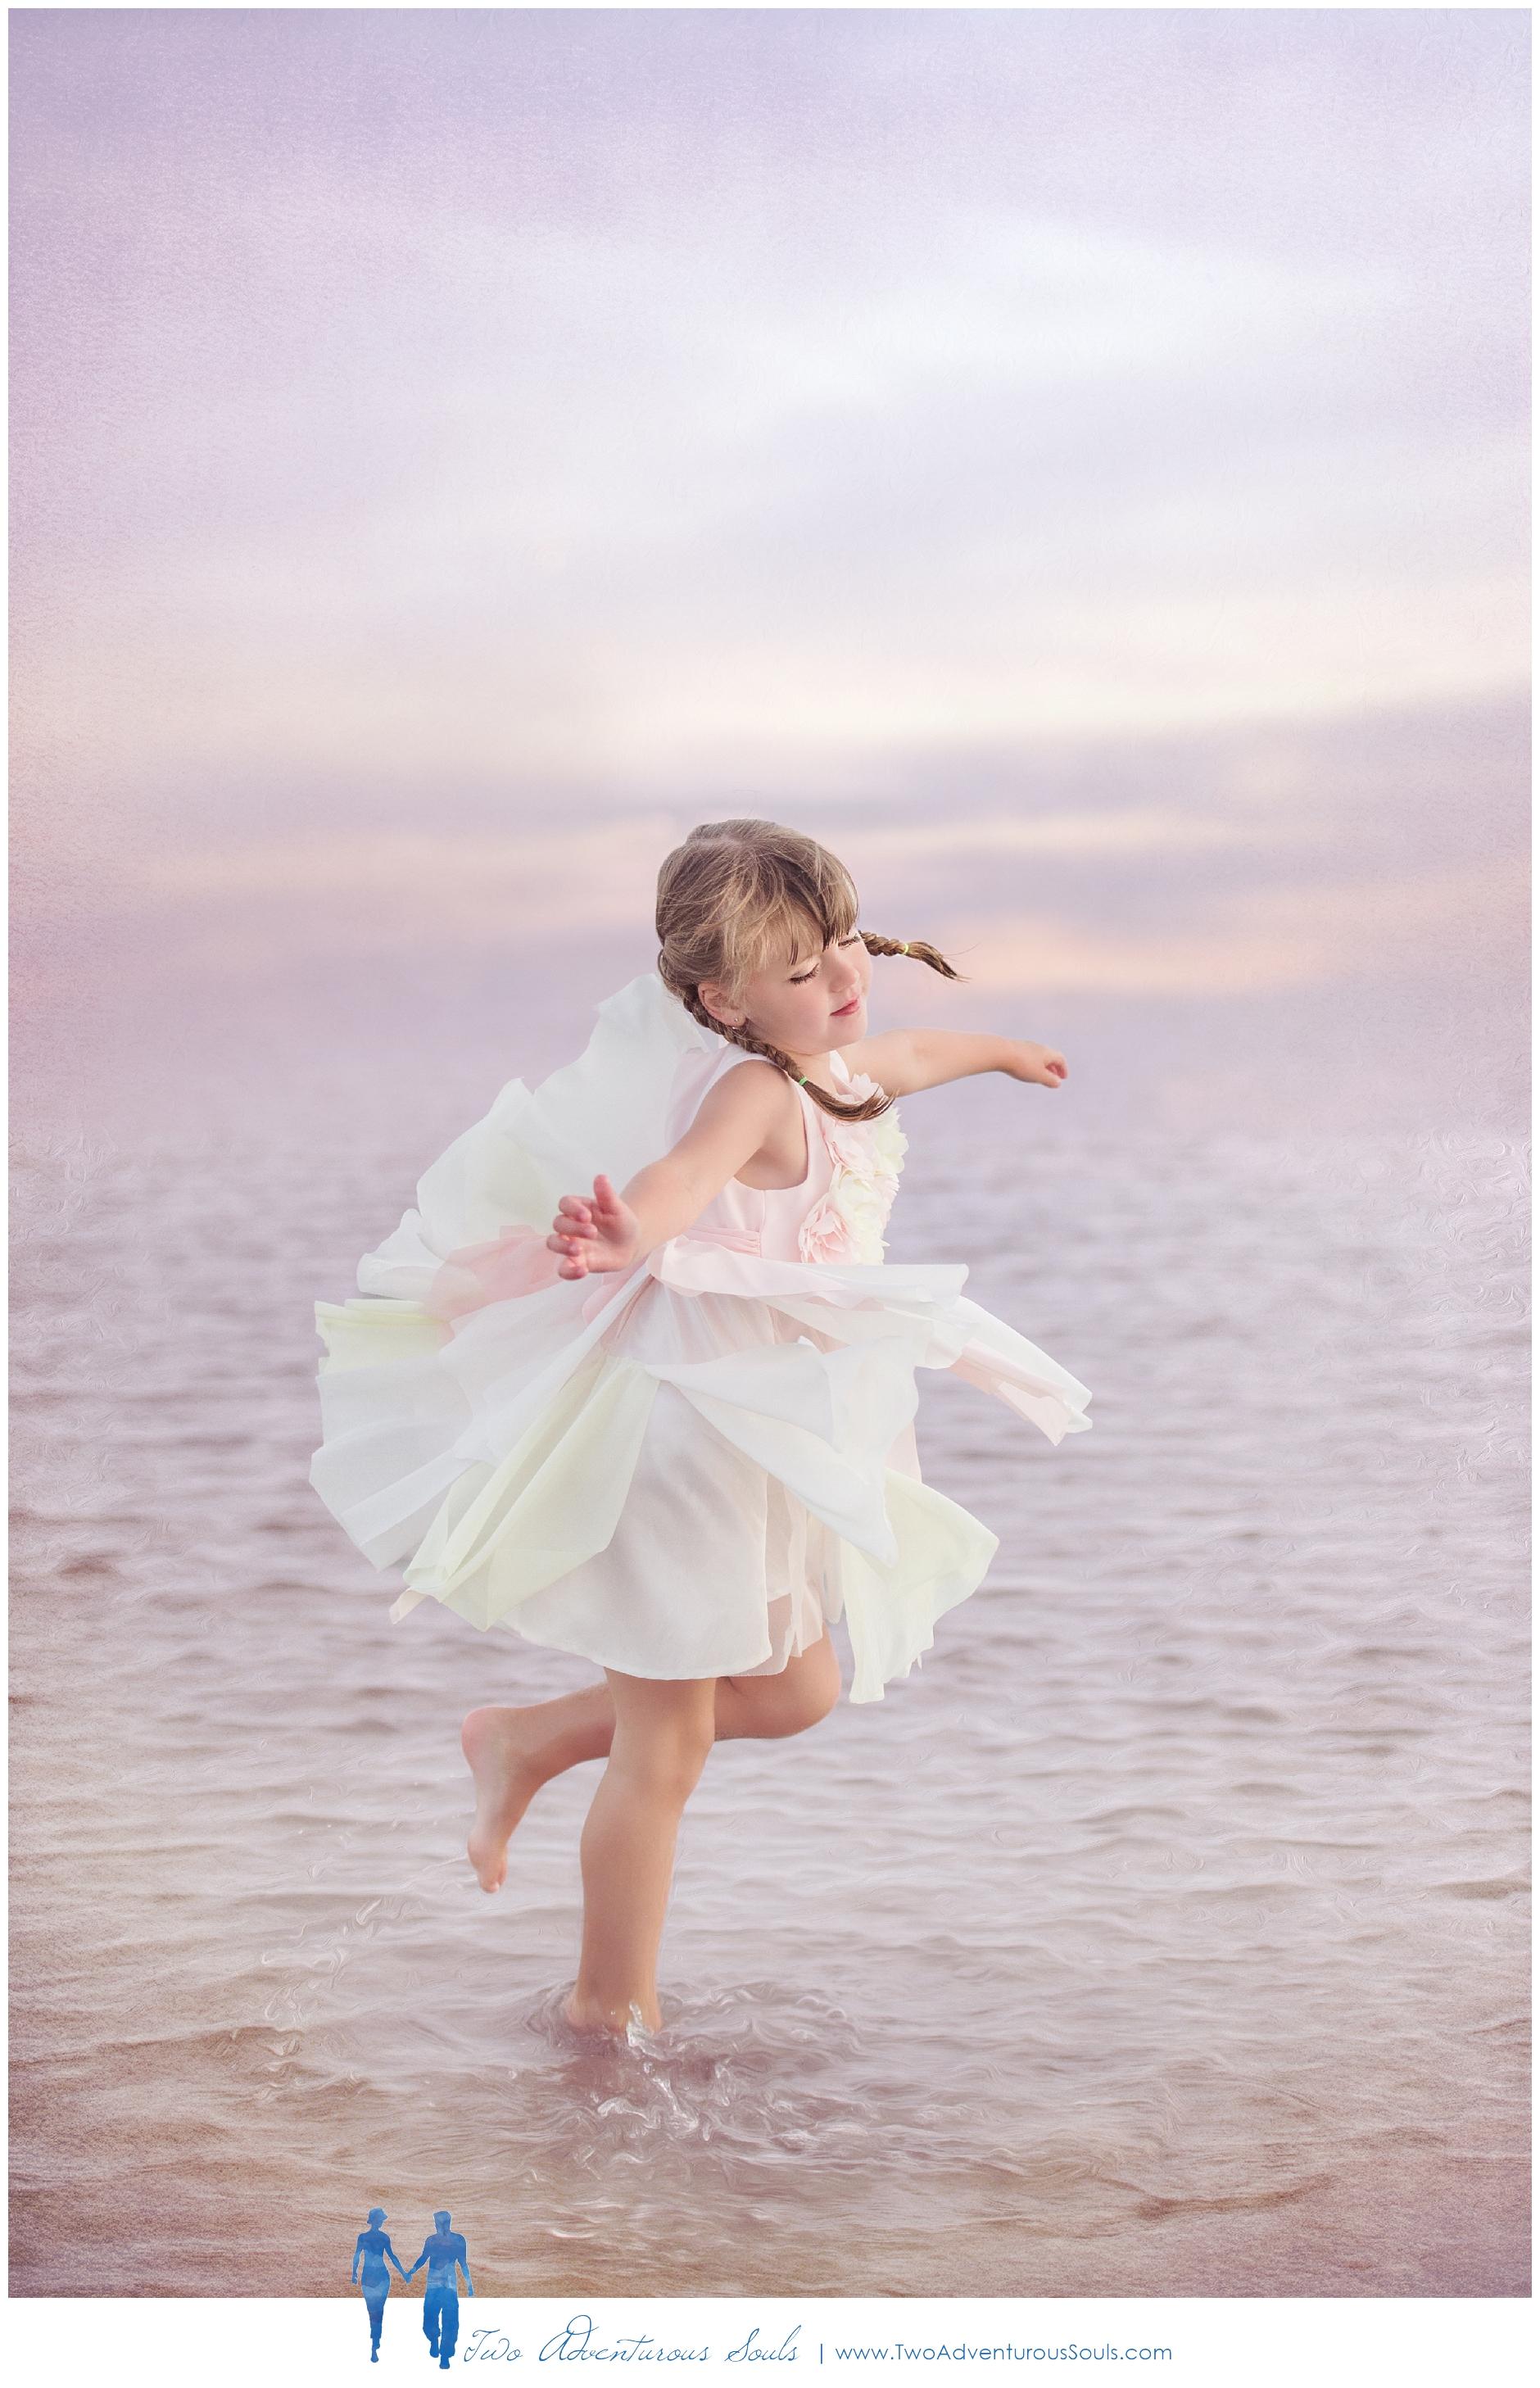 Old Orchard Beach Family Portraits, Fine Art Portraits - Ballerina dancing on the beach